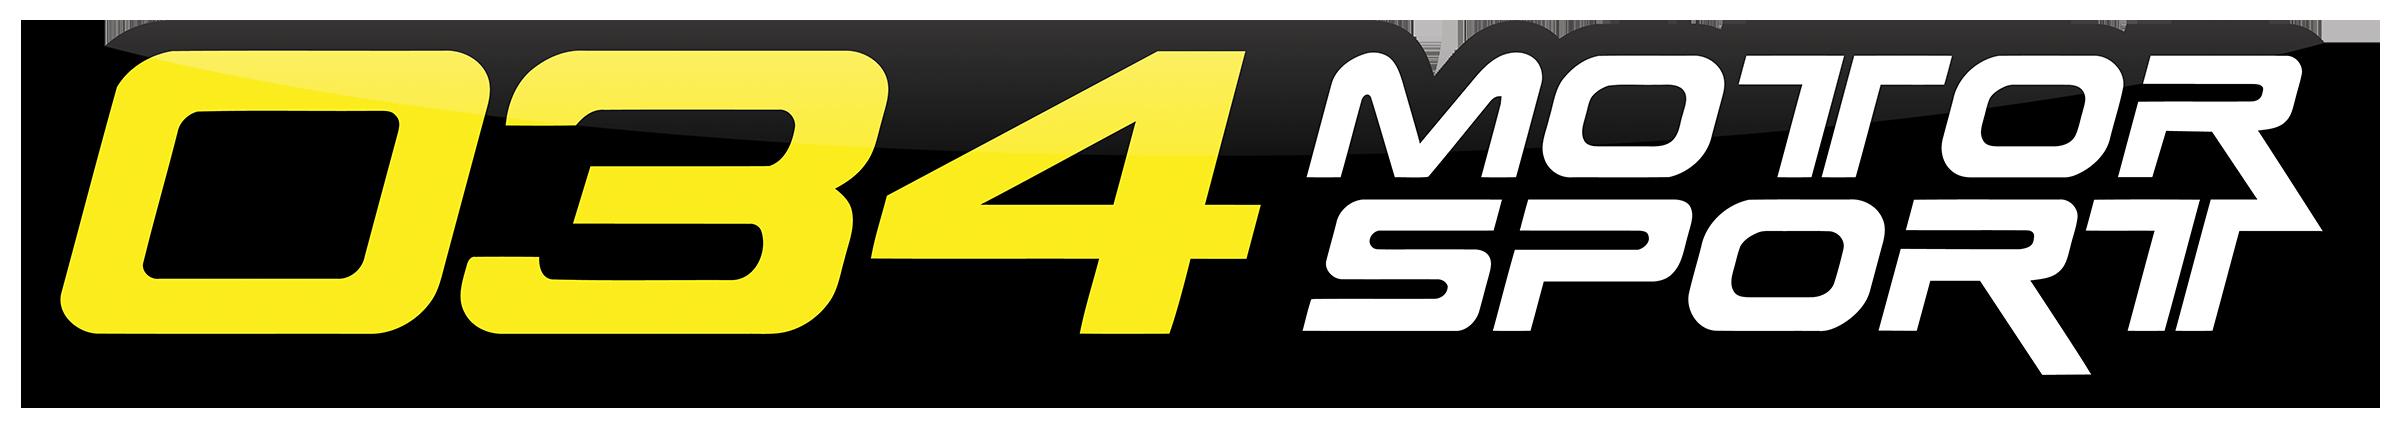 034 Motorsport Parts